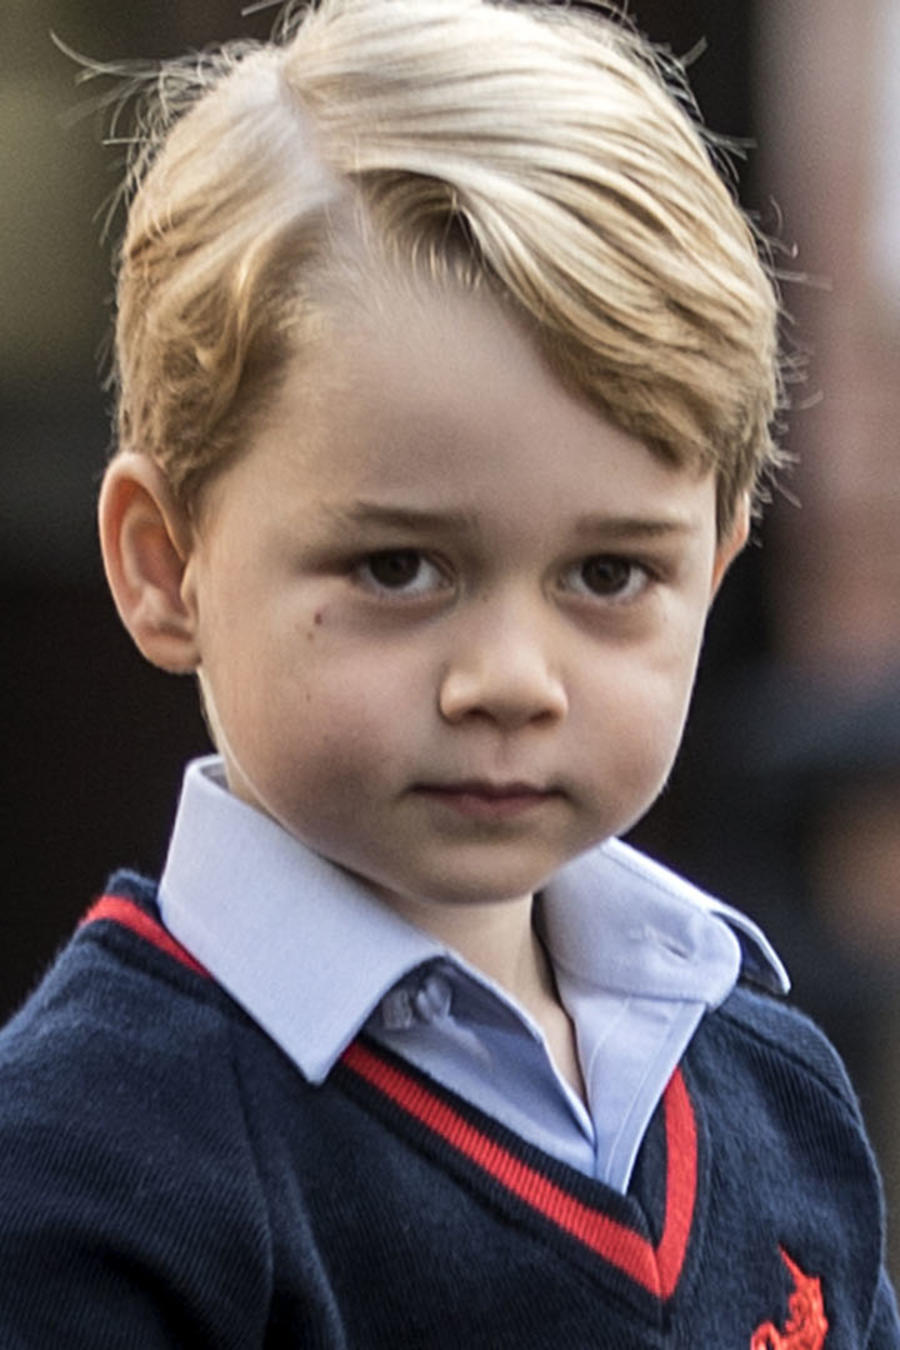 príncipe george 2018